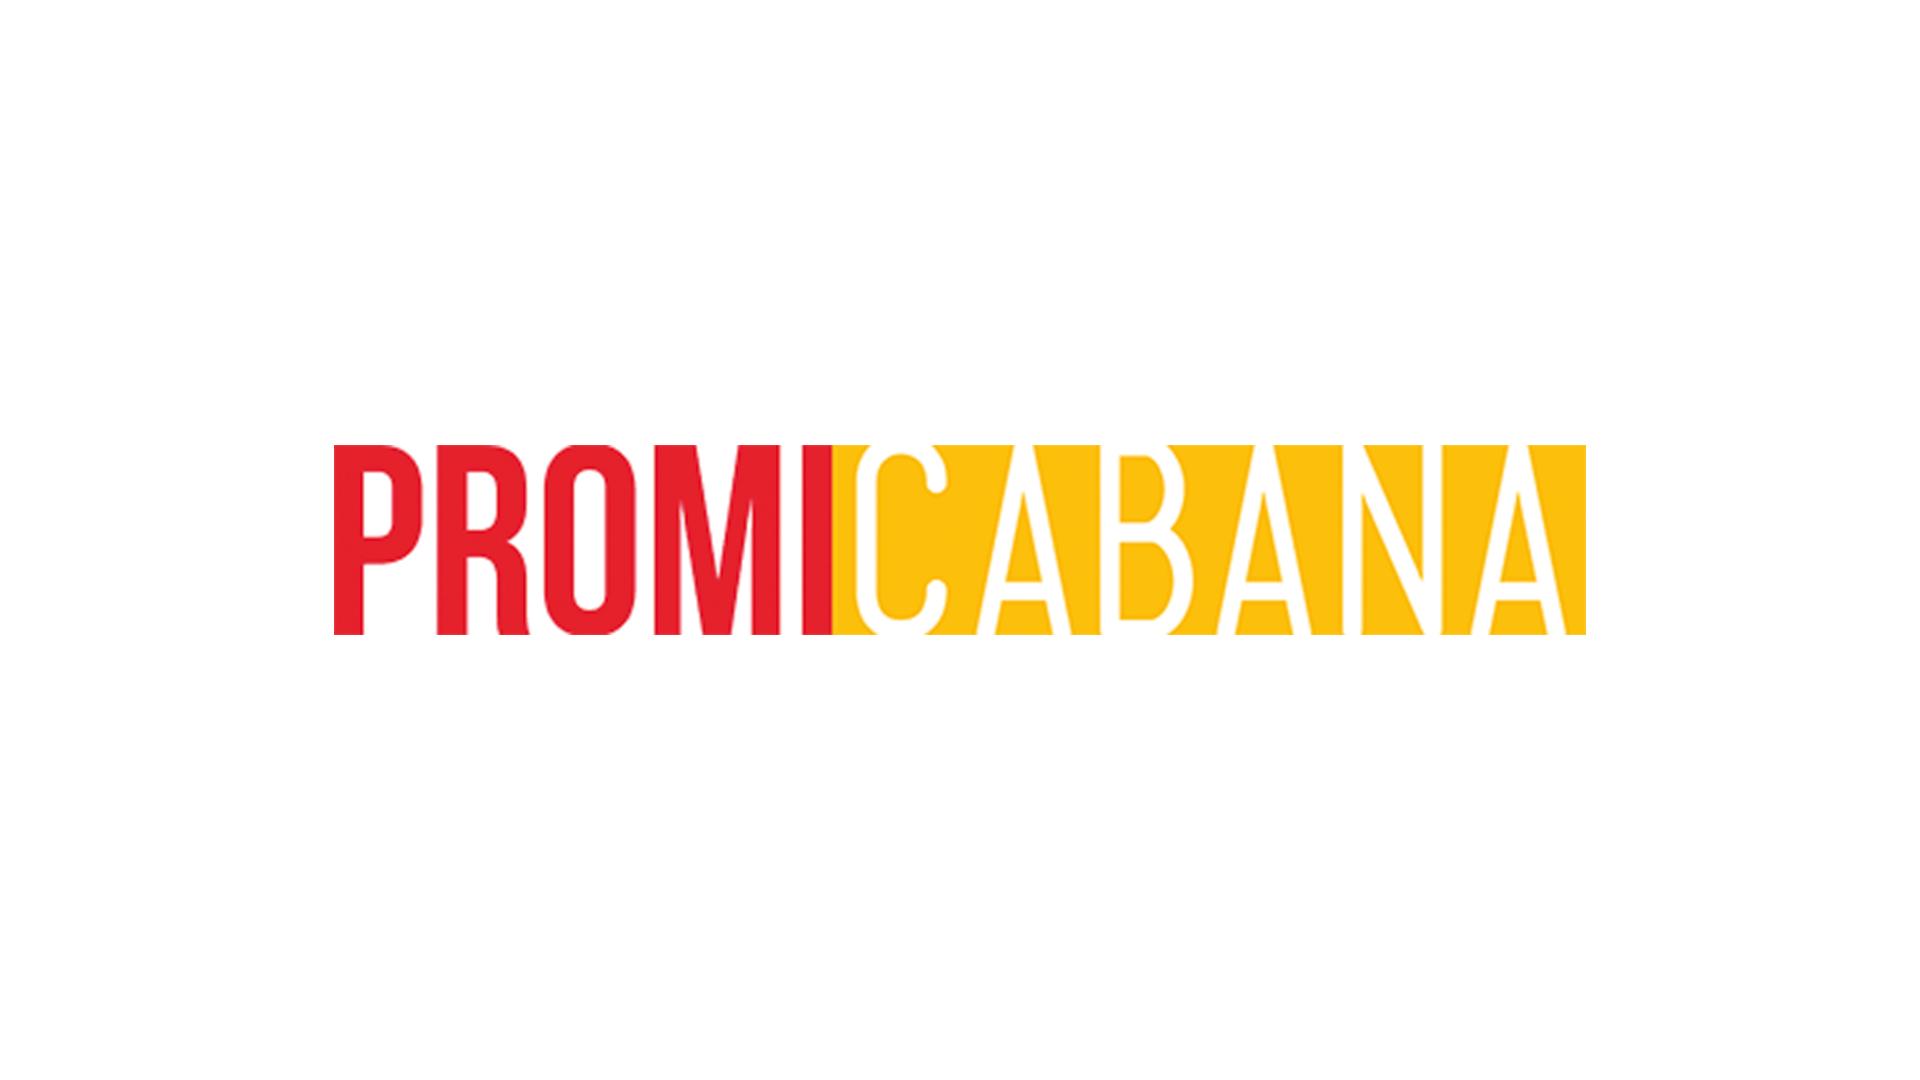 Ashton-Kutcher-Charlie-Sheen-Two-and-a-Half-Men